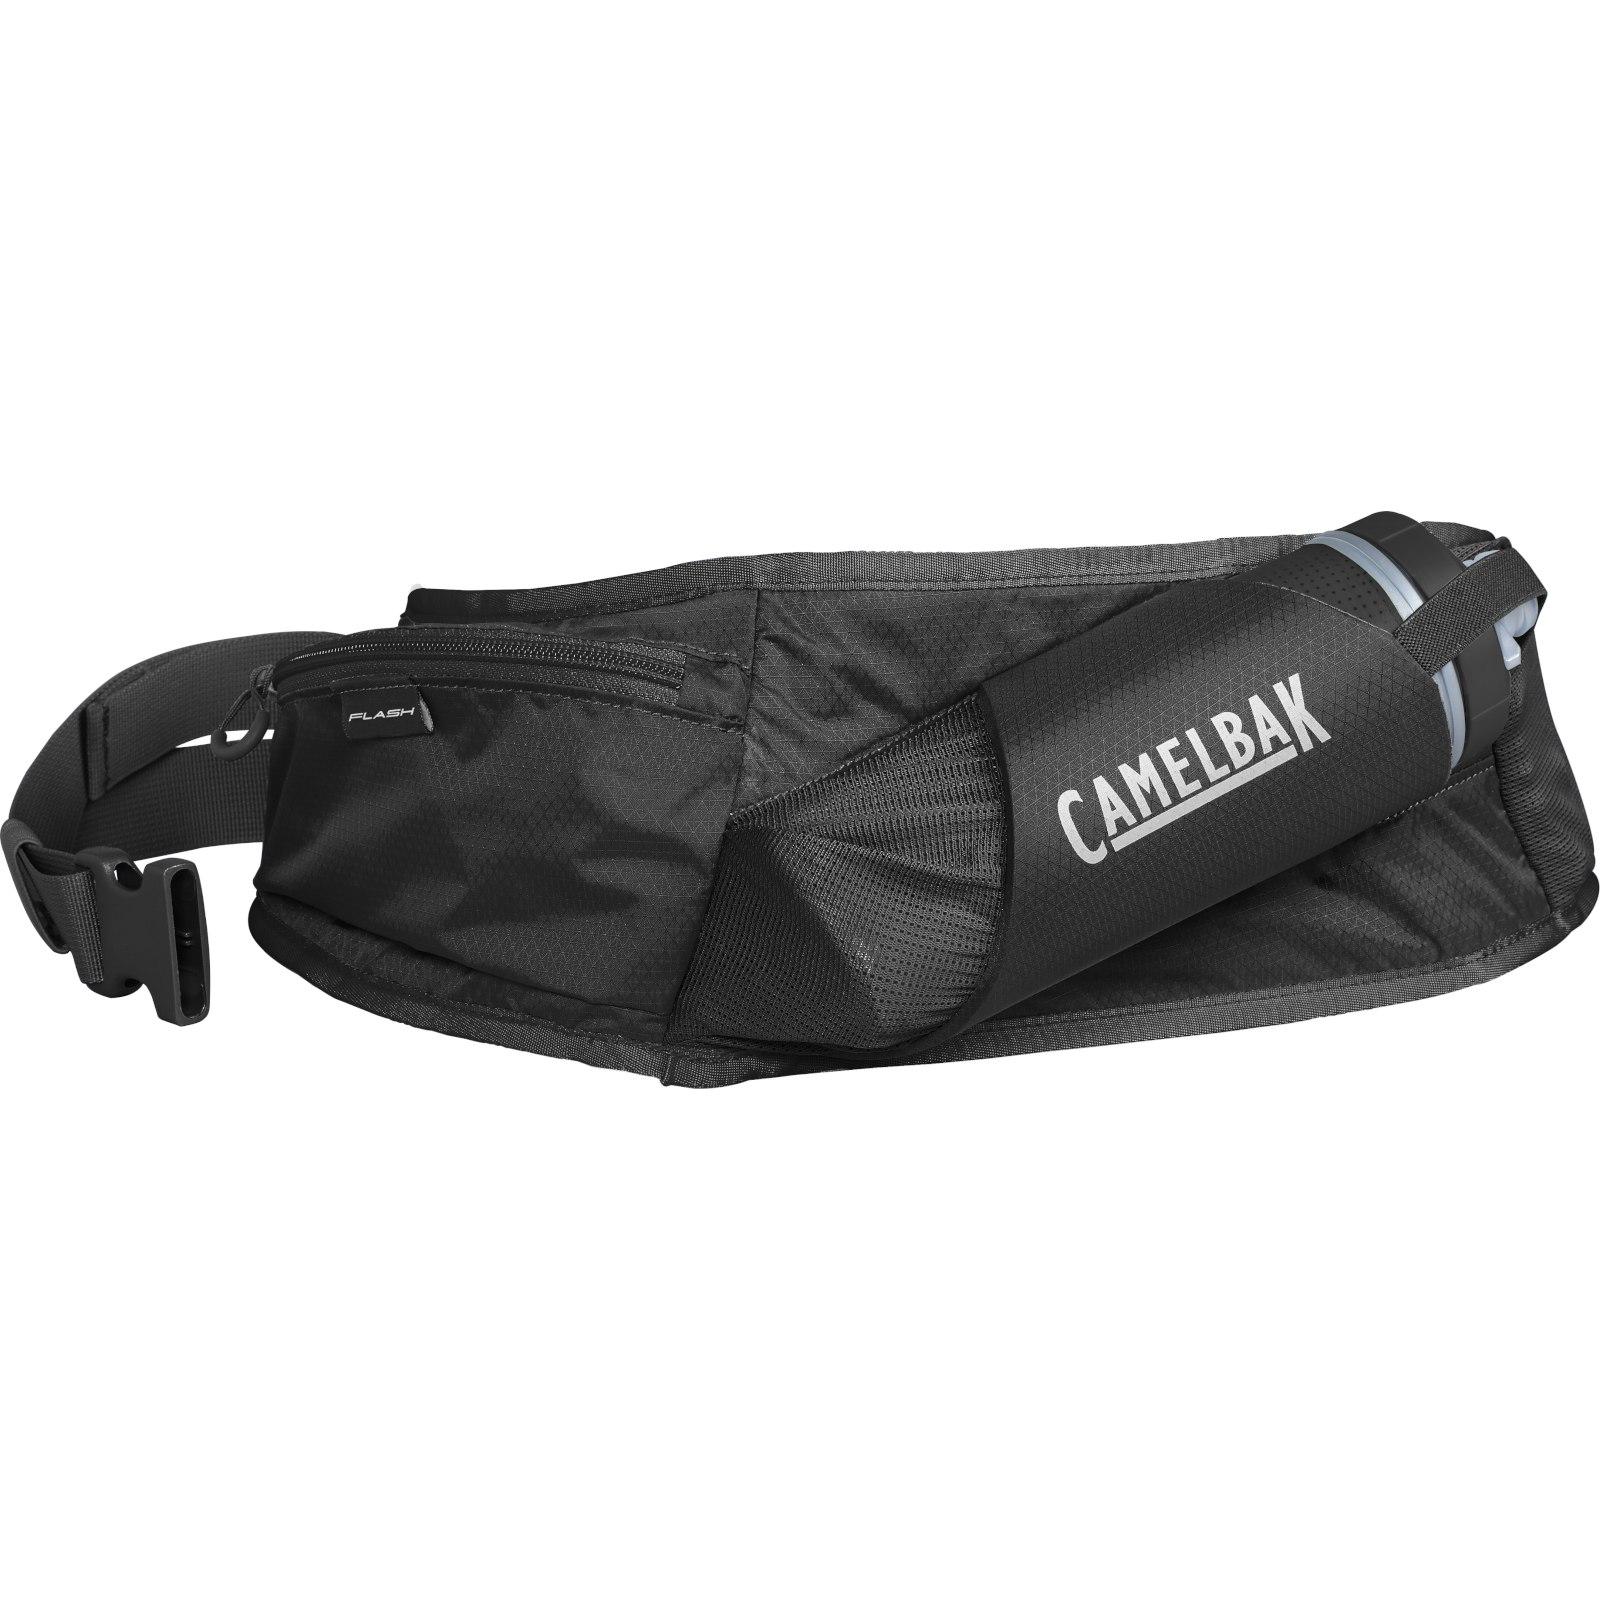 Foto de CamelBak Flash Belt Hip Pack + Hydro Pack - Black